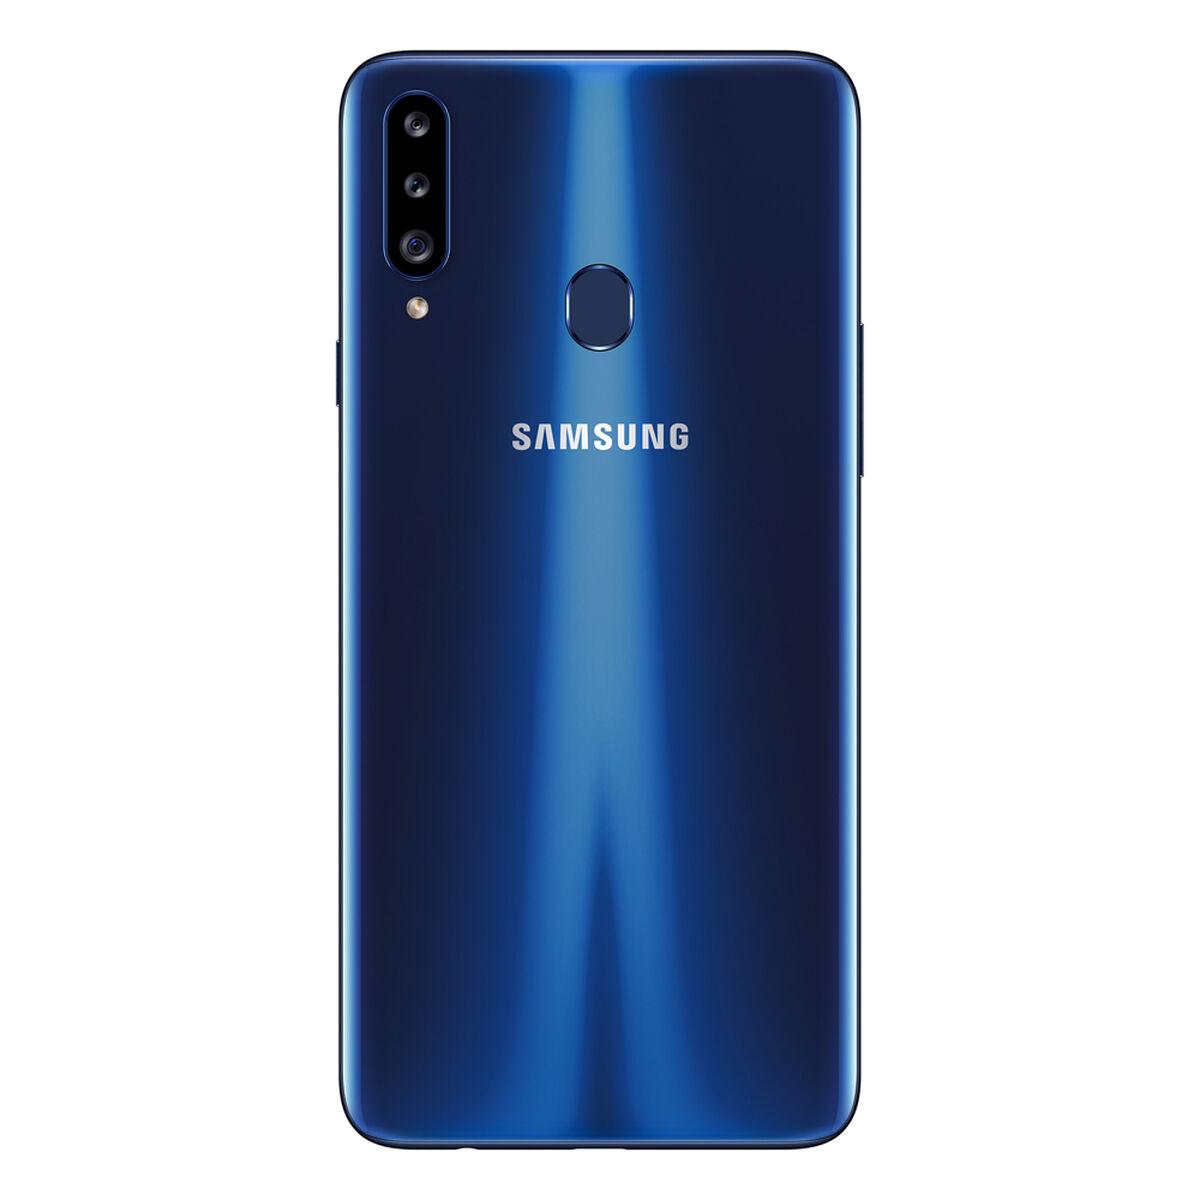 "Celular Samsung Galaxy A20s 32GB 6.4"" Azul Liberado"